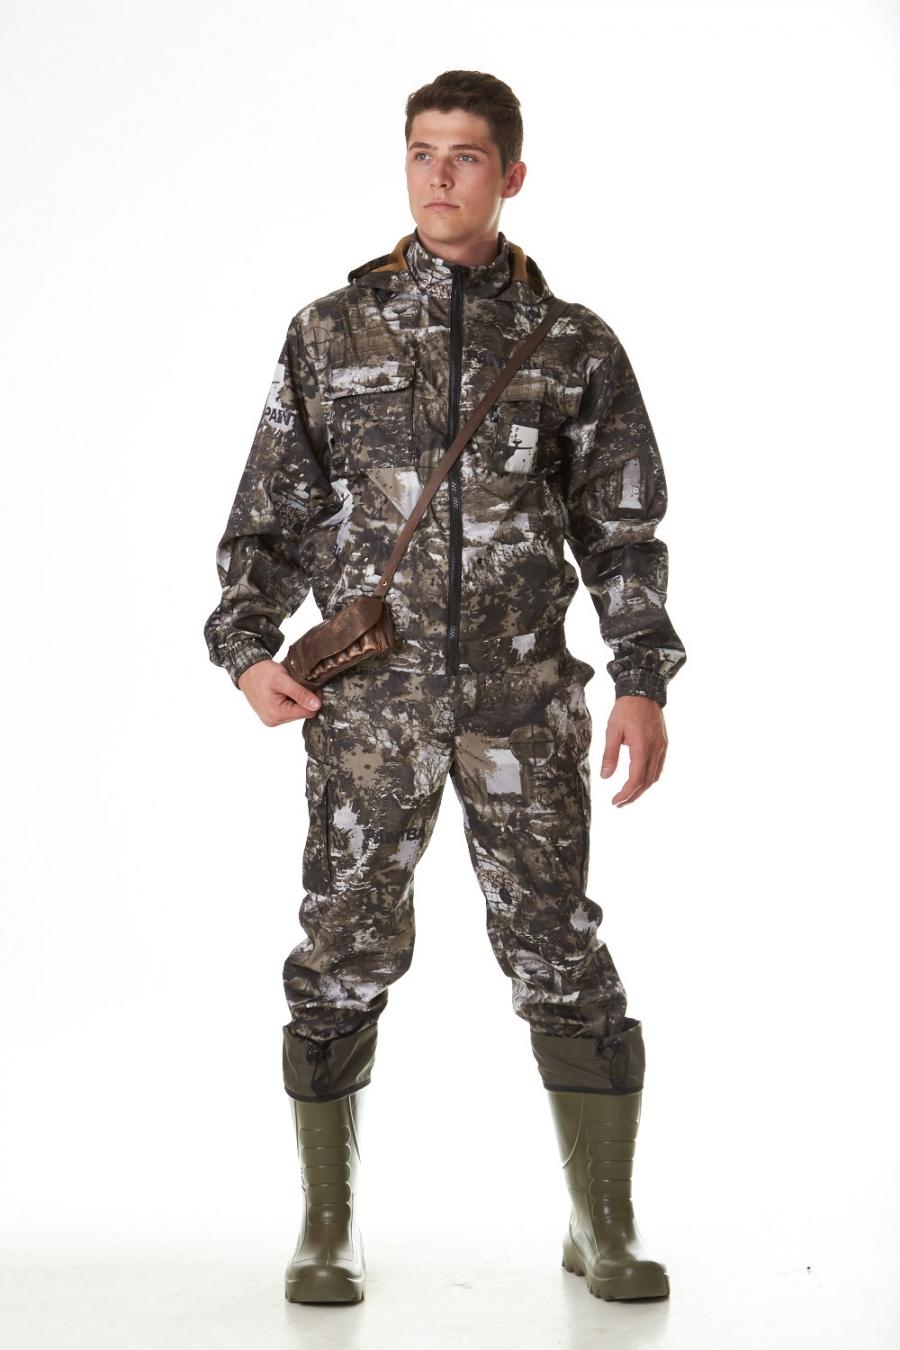 Костюм для охоты и рыбалки Лес-2Одежда для охоты и рыбалки<br><br><br>Размер: 62